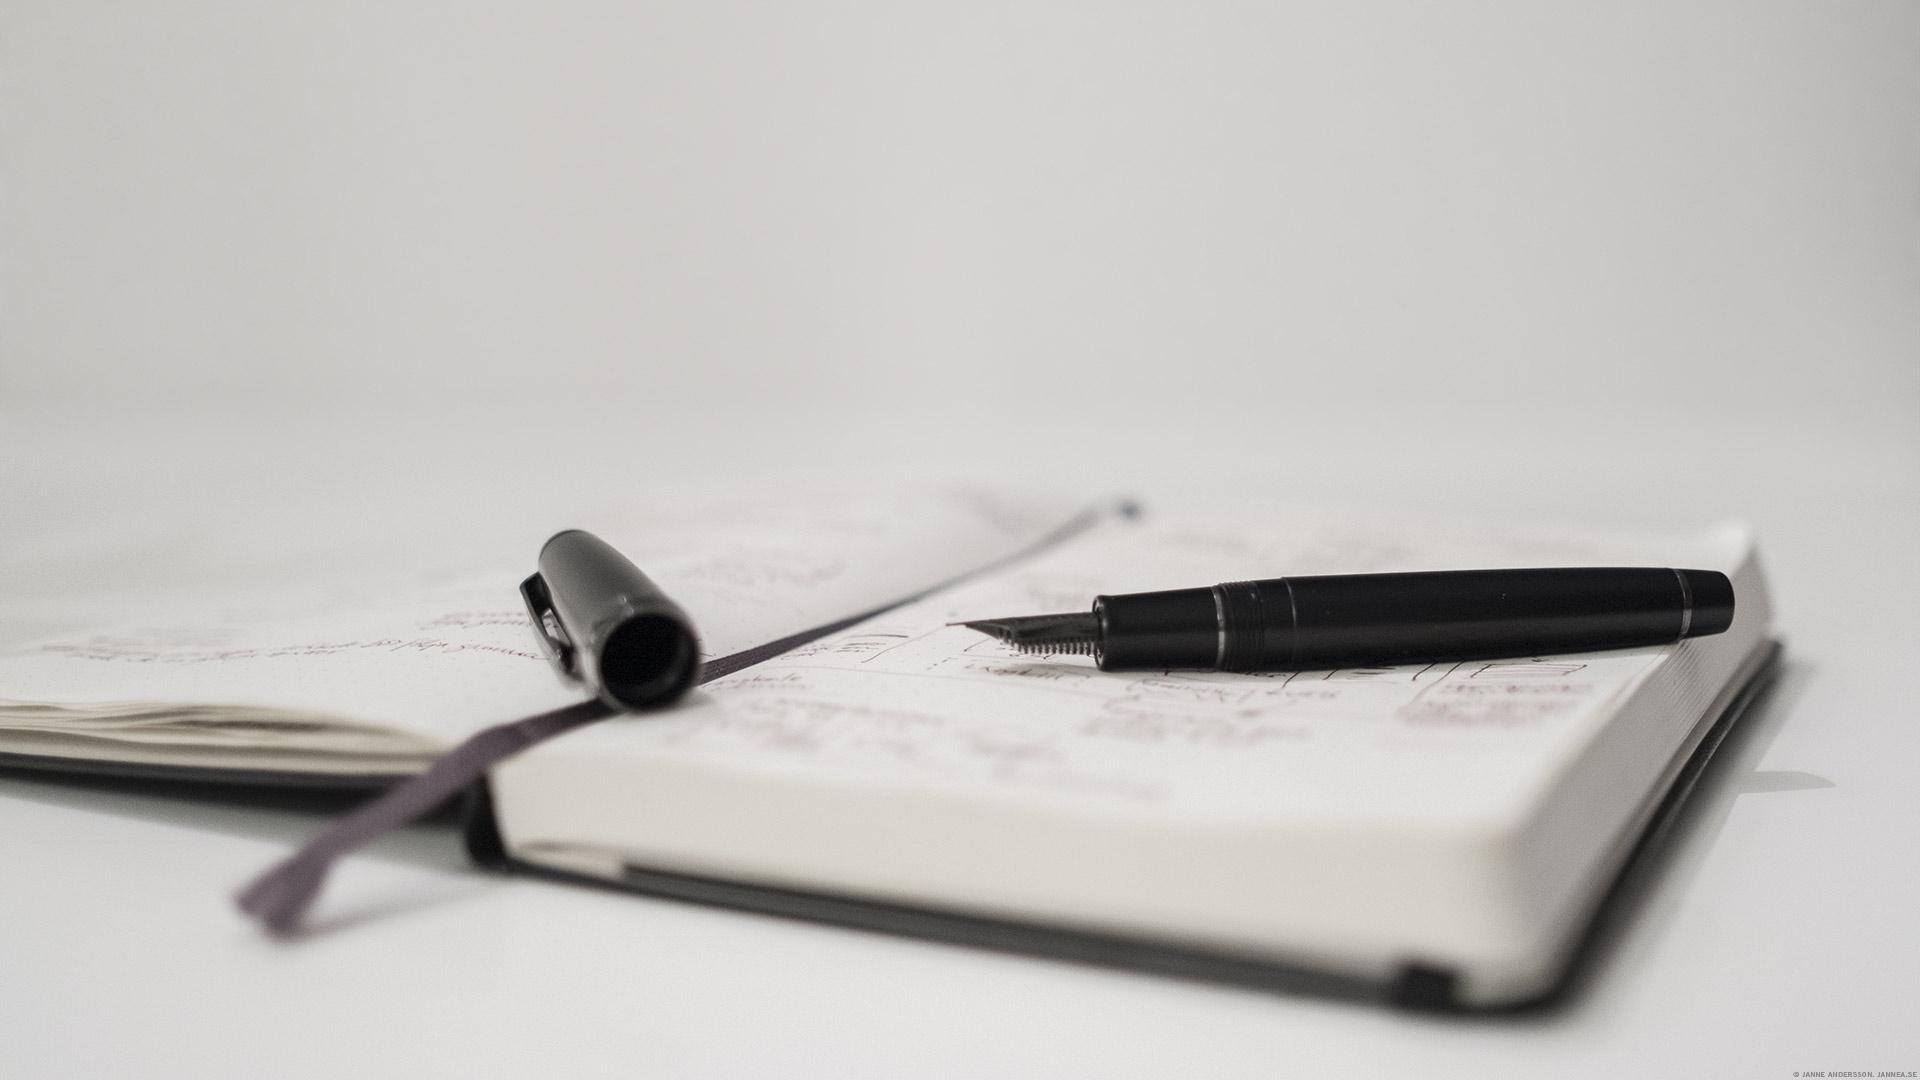 Favoritpennan och anteckningsboken|© Janne A